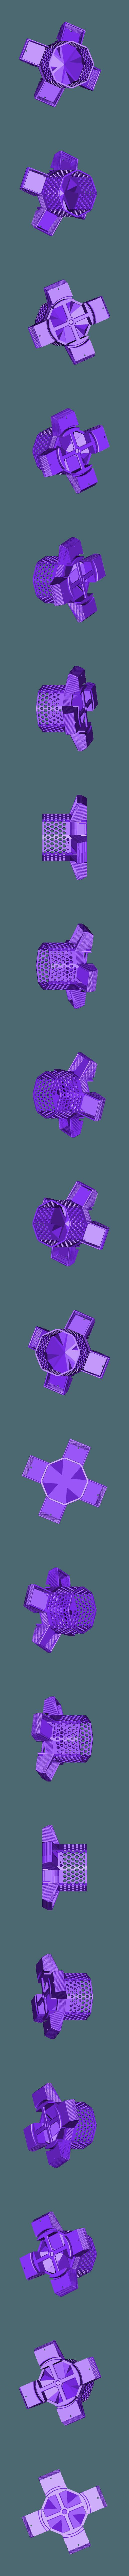 Feeder.stl Download free STL file Bird Feeder [prusament spool] • 3D print model, 3d-dragar